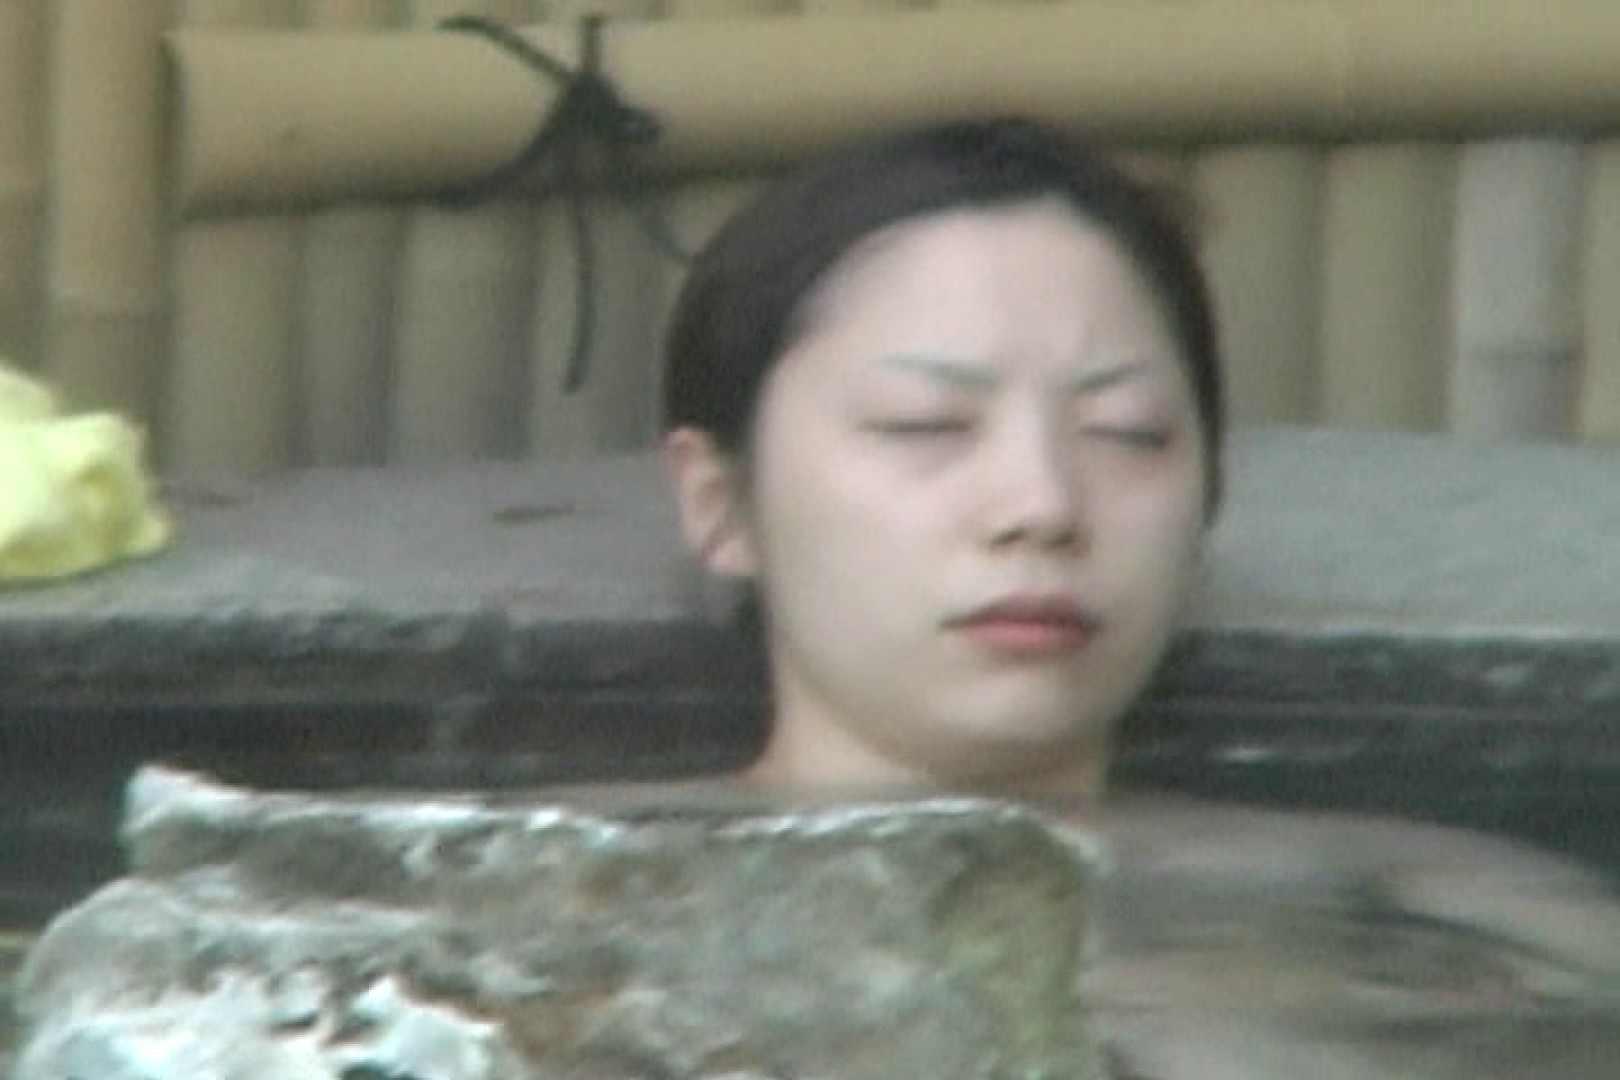 Aquaな露天風呂Vol.596 盗撮シリーズ | 露天風呂編  113PIX 77